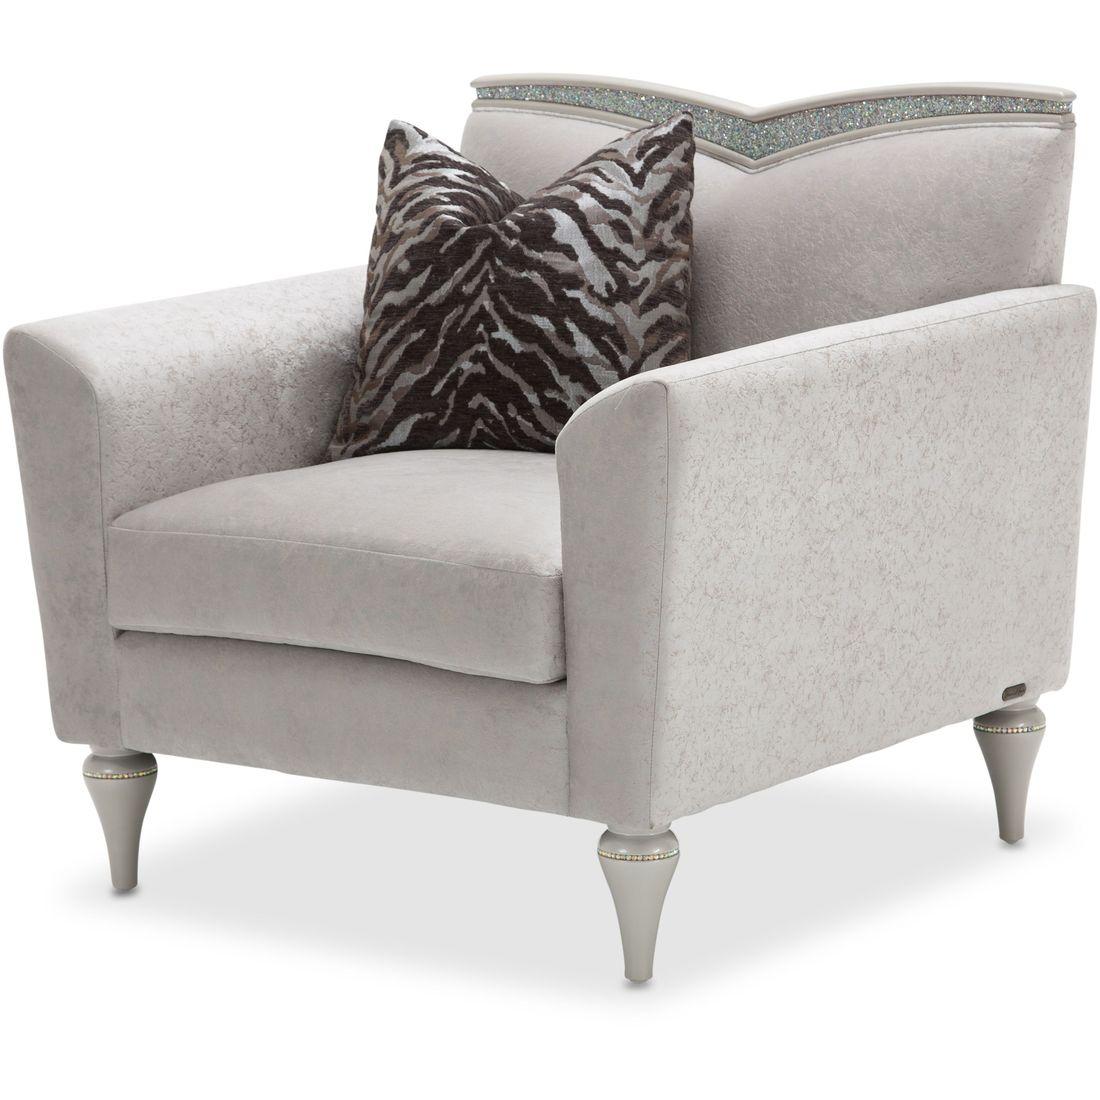 AICO Michael Amini Melrose Plaza V Back Sofa Living Room Set